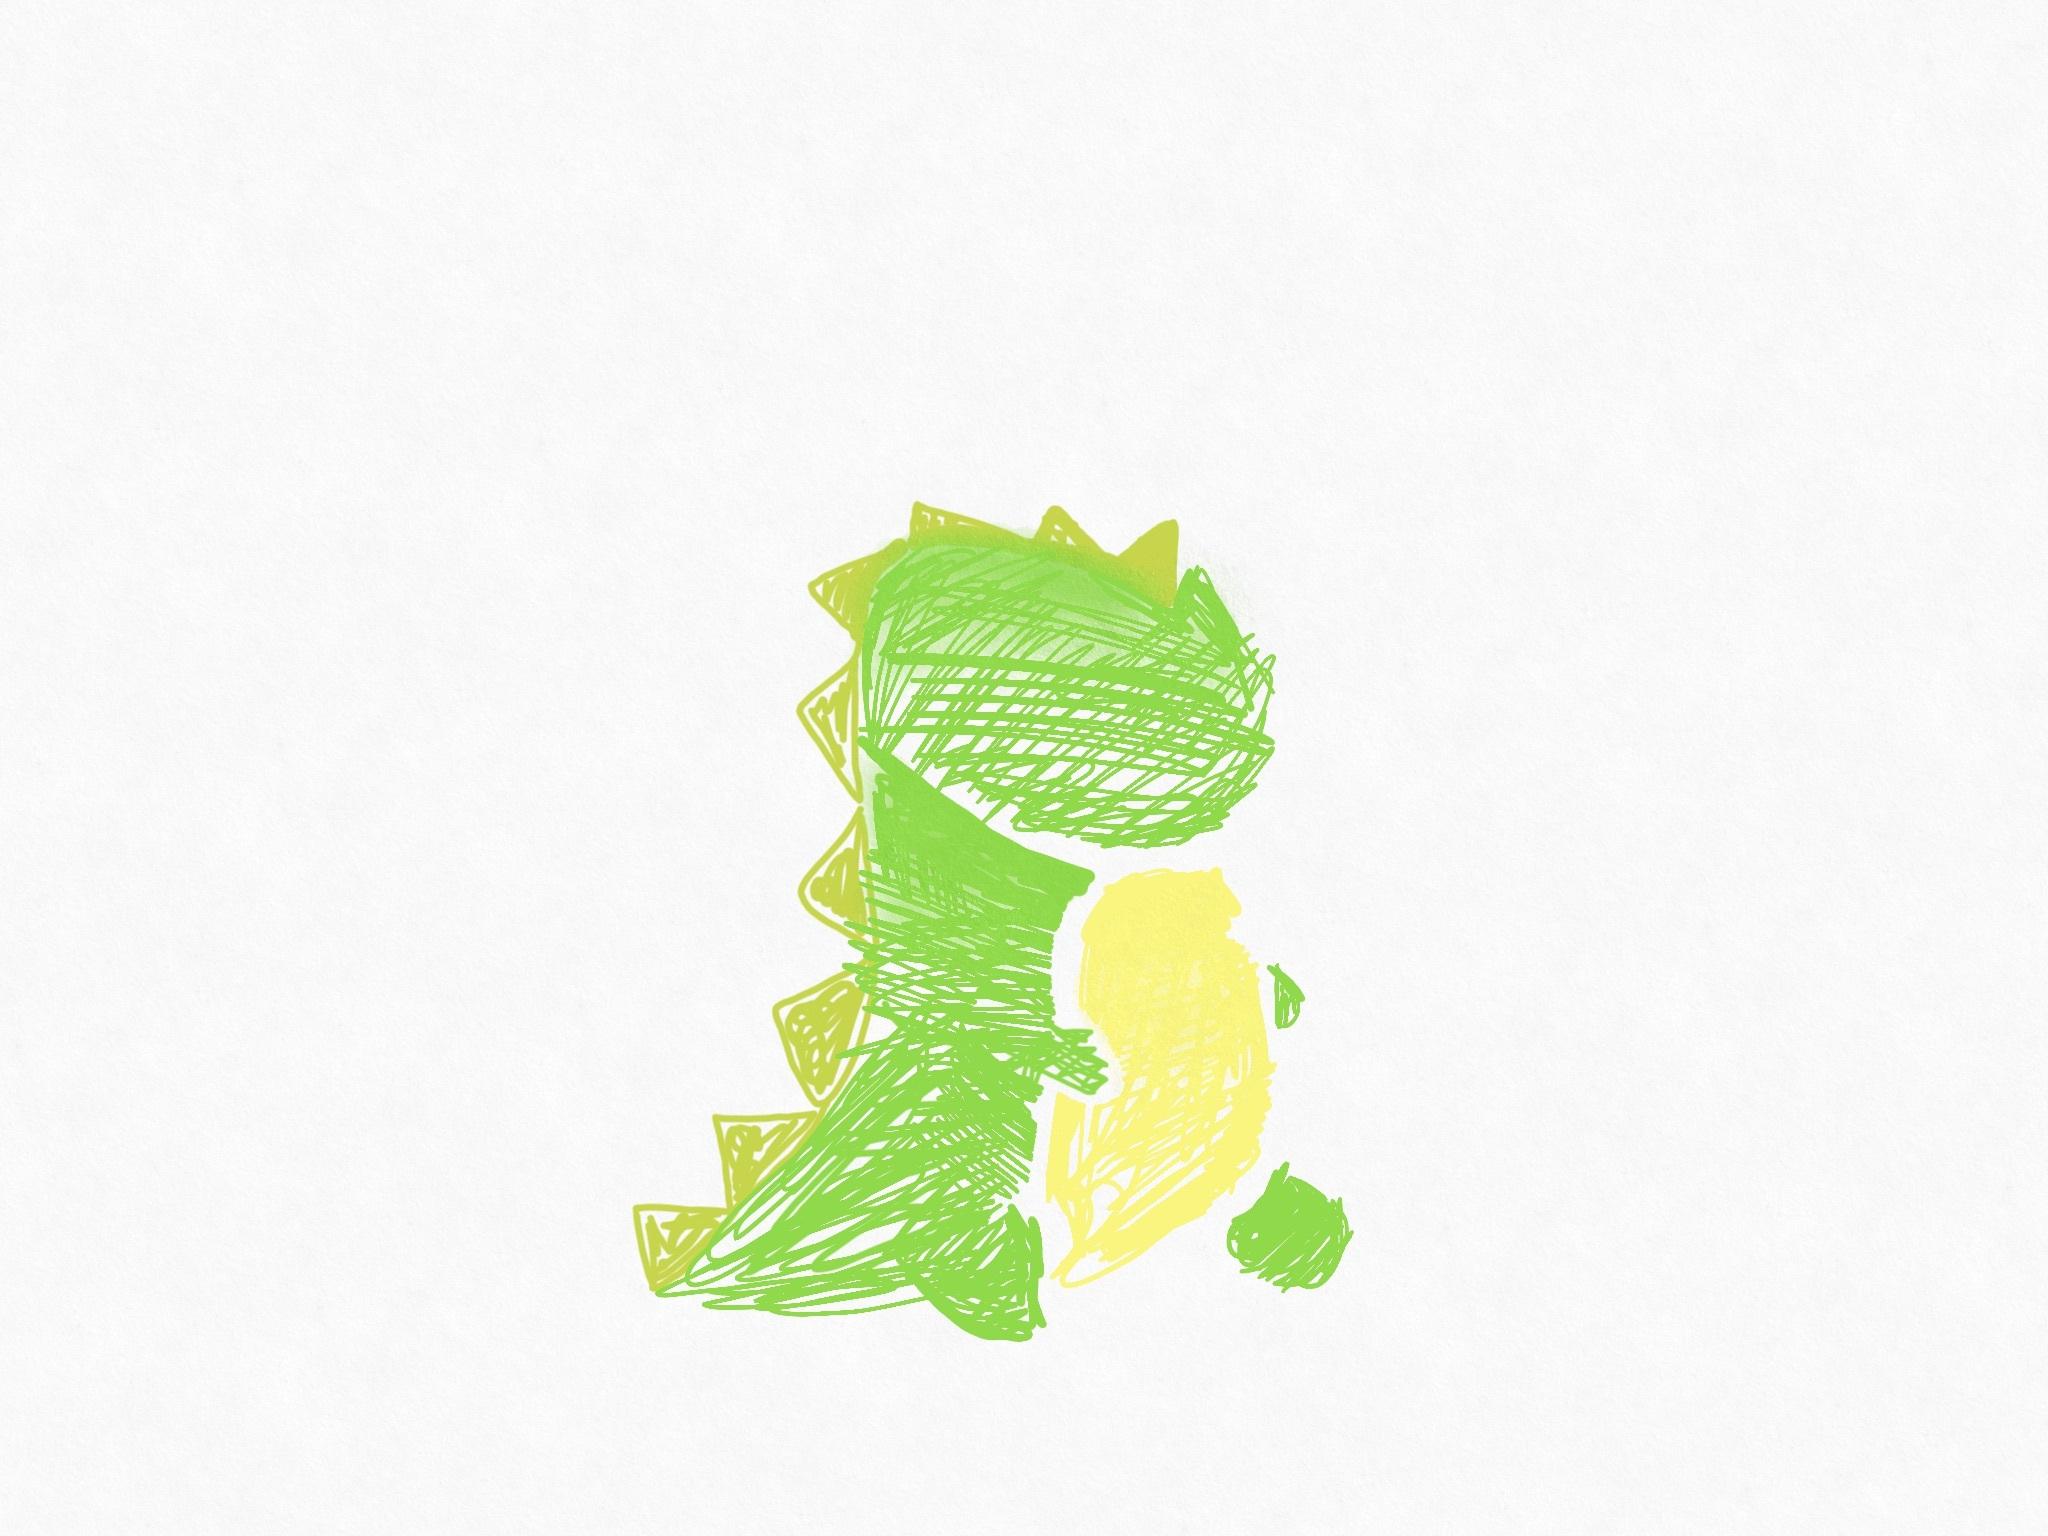 https://cloud-bmw1i0pmv.vercel.app/0random-dinosaur2.jpg